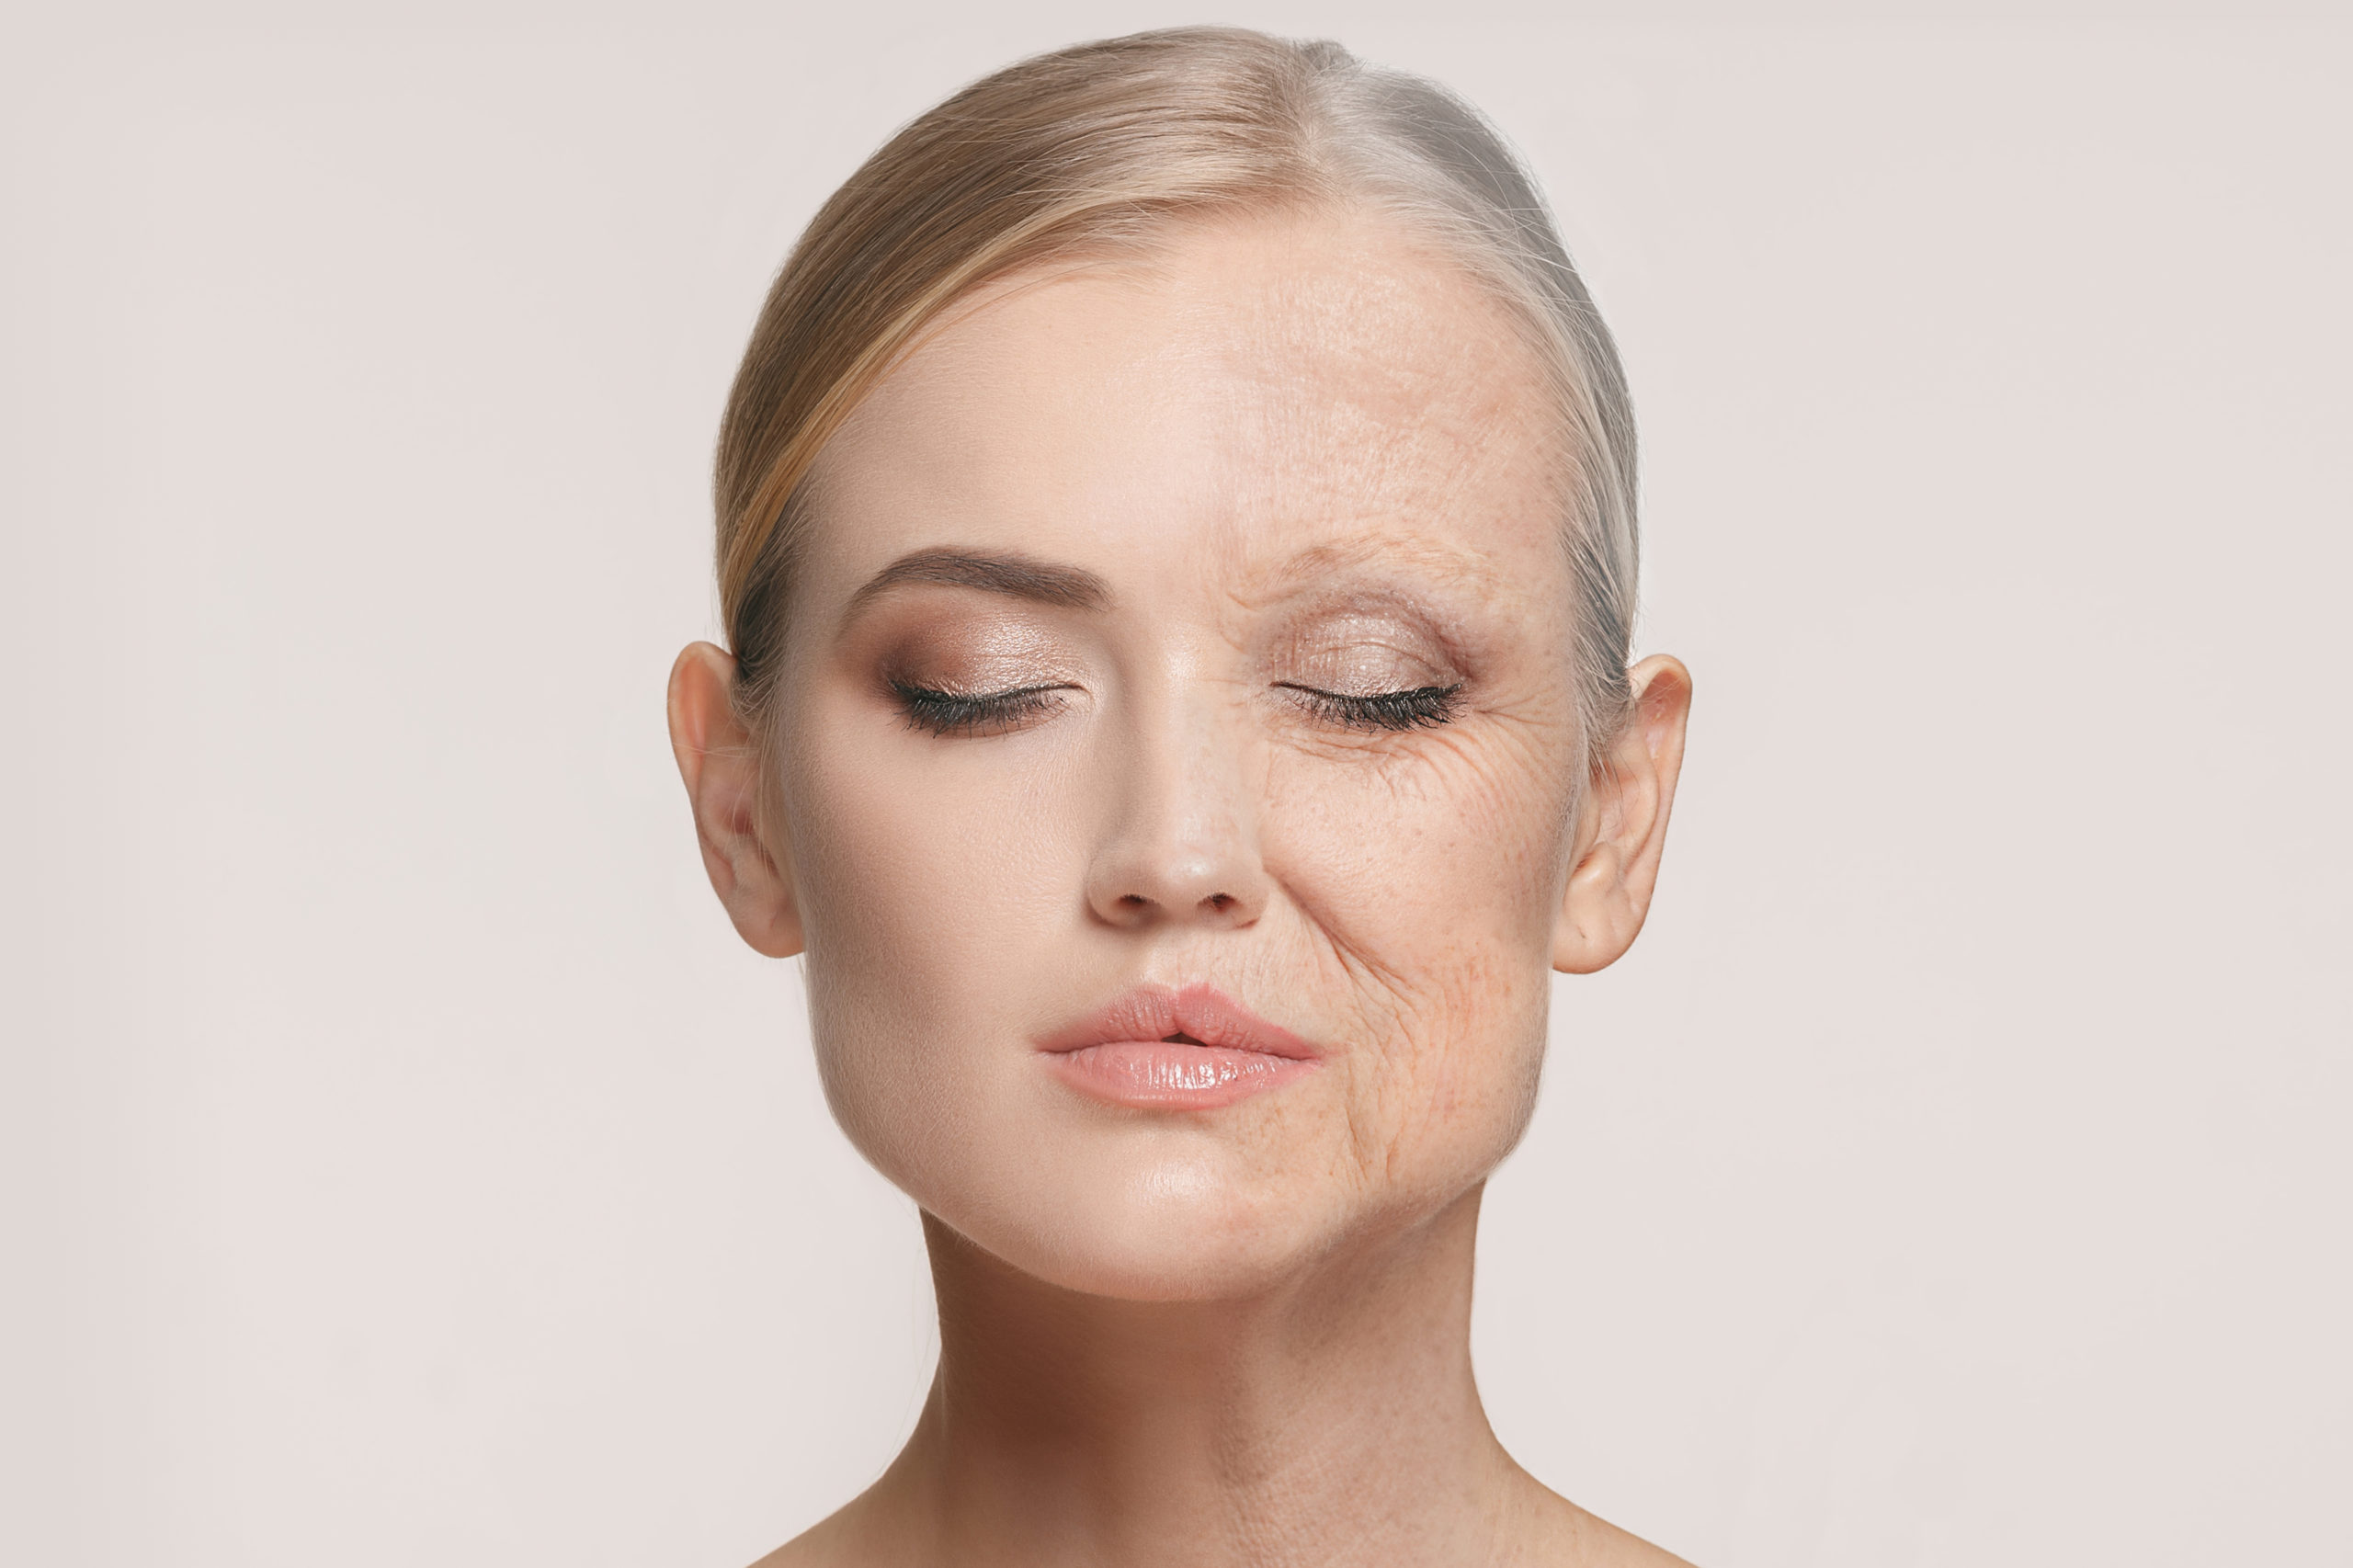 Wrinkles, Ageing, Anti-wrinkle, Anti-ageing, Skin treatment